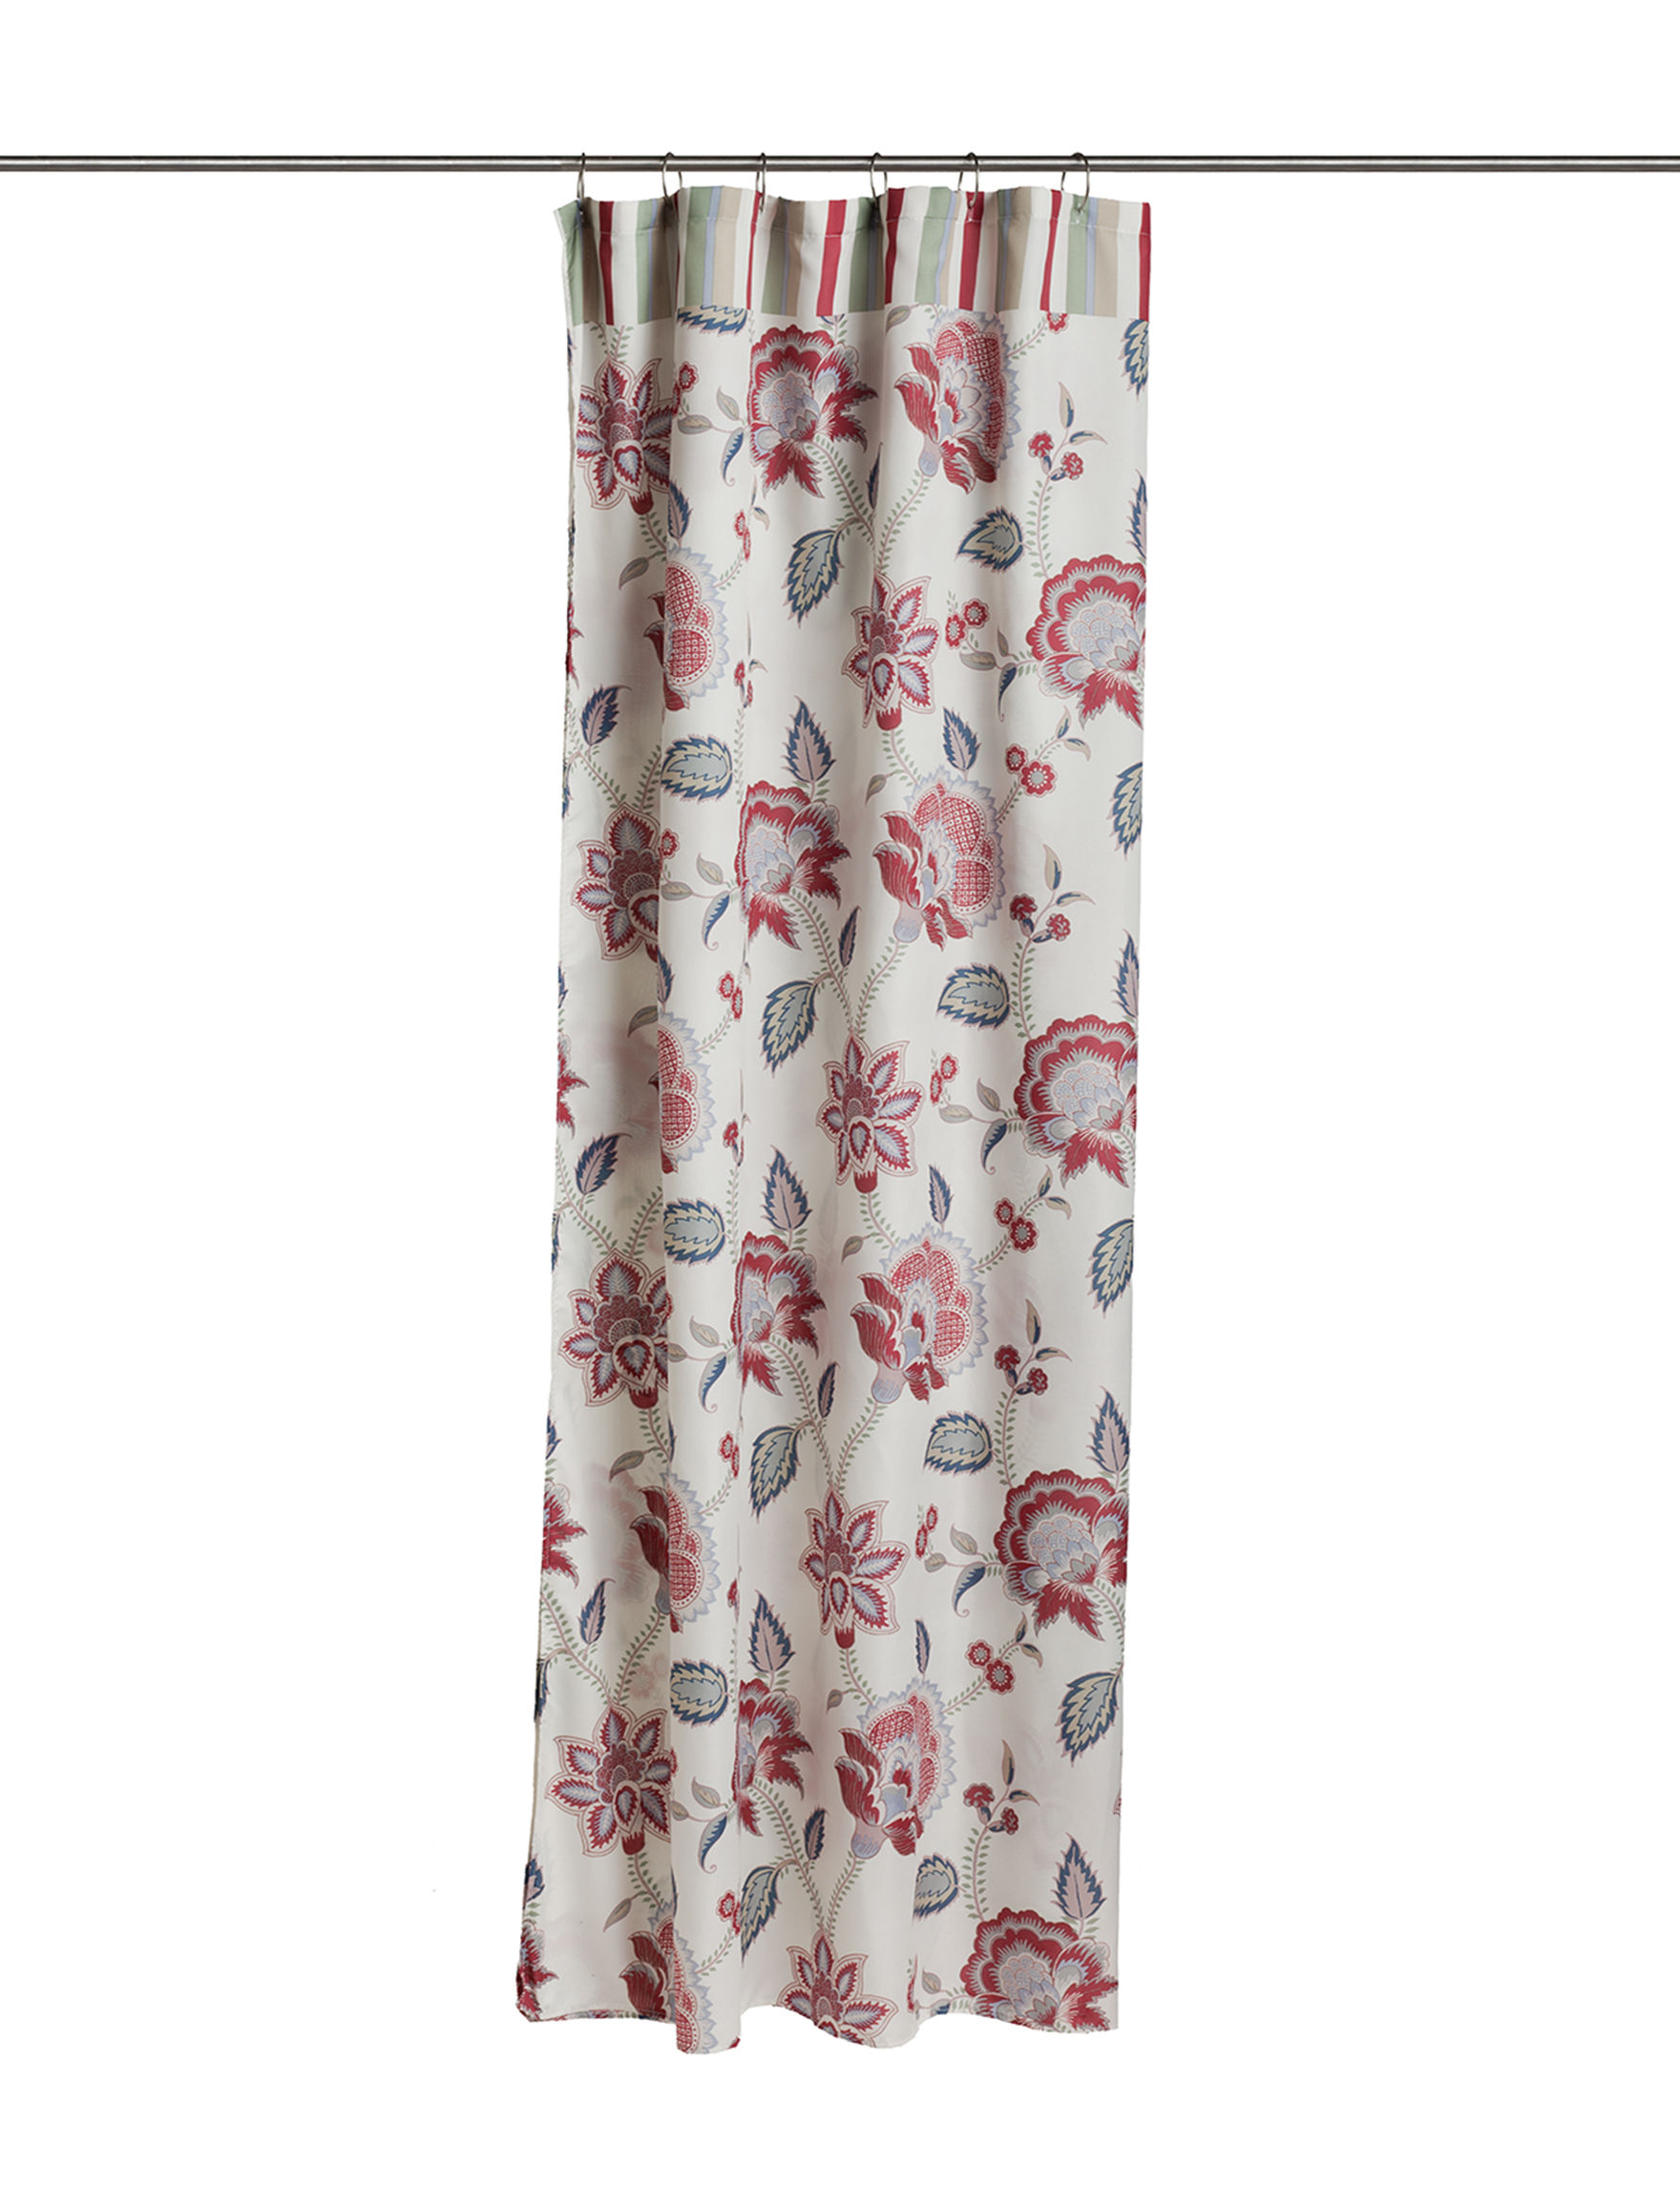 Avanti White Multi Shower Curtains & Hooks